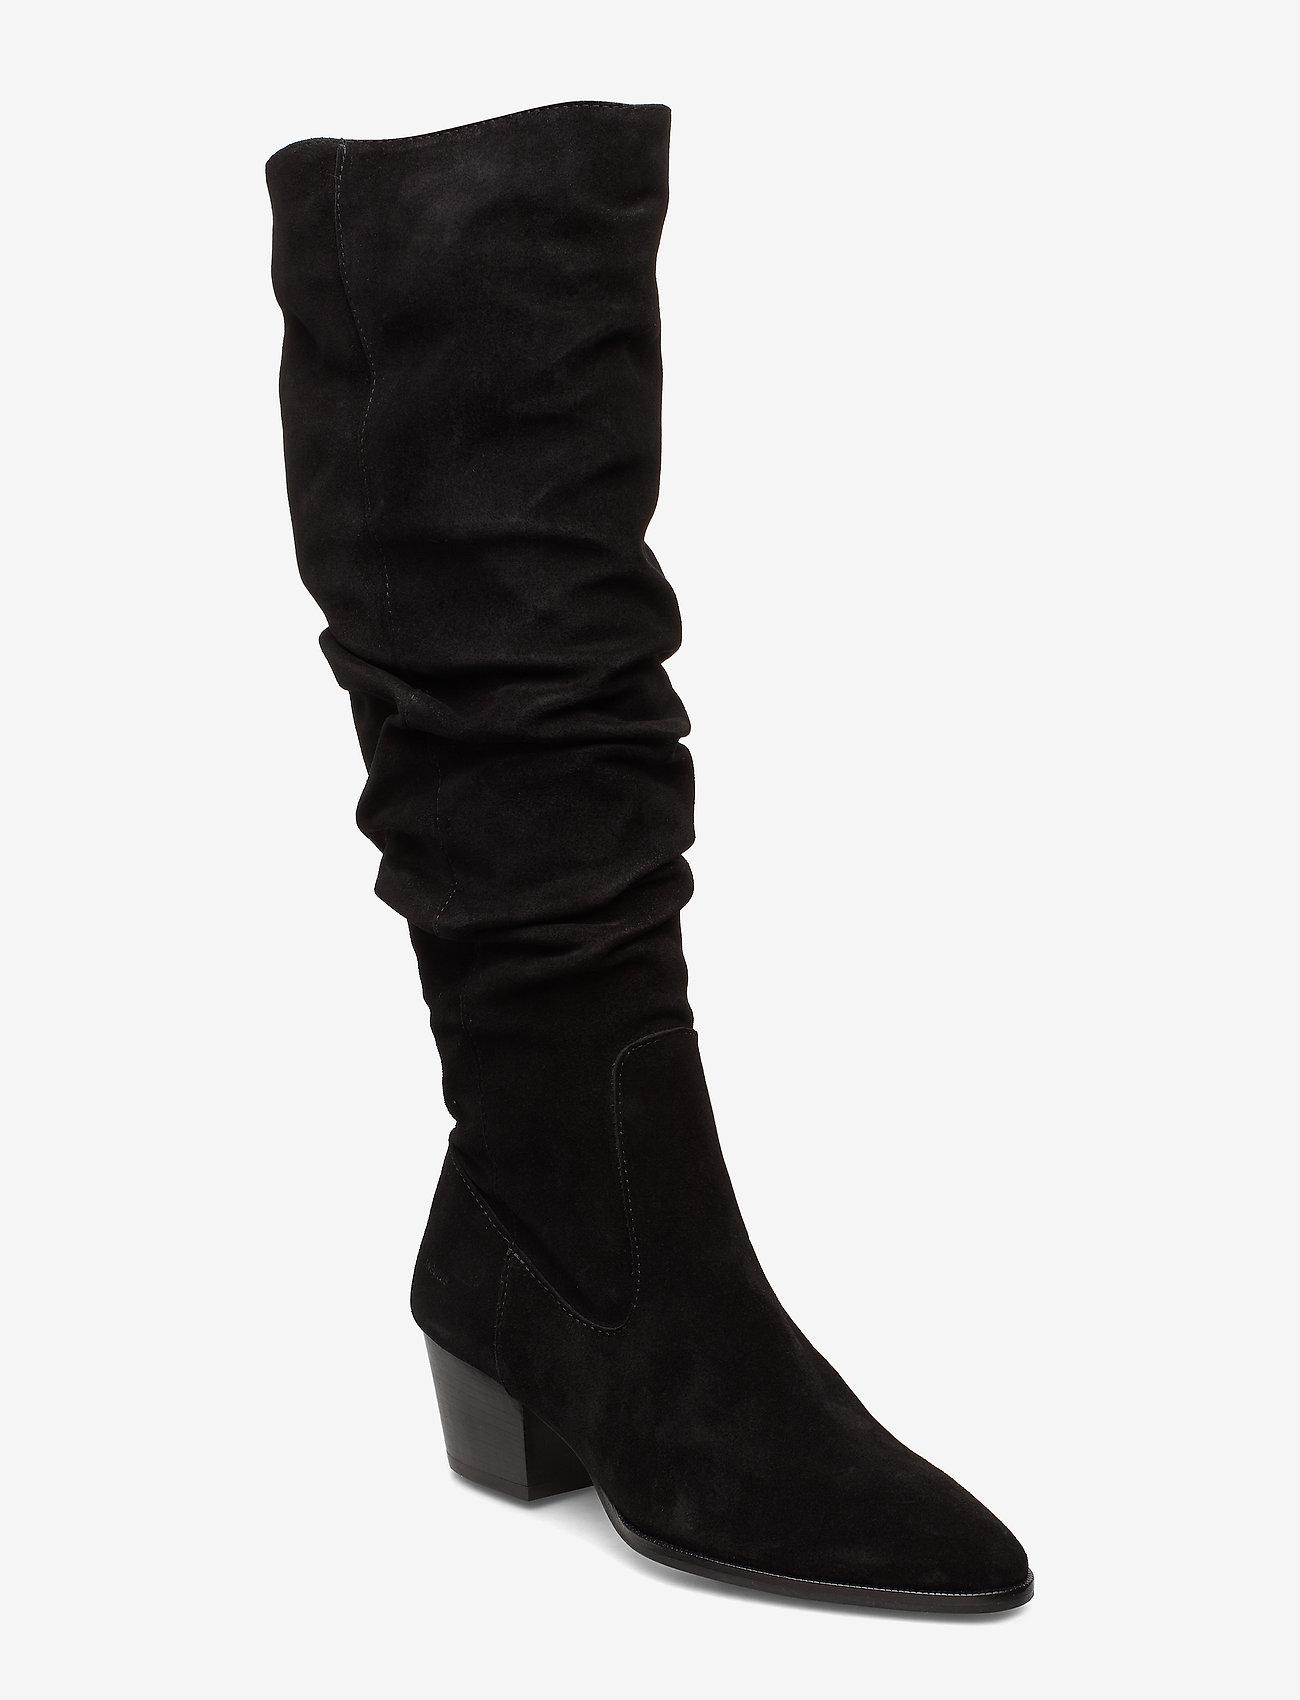 ANGULUS - Bootie - block heel - with zippe - bottes hautes - 1163 black - 0